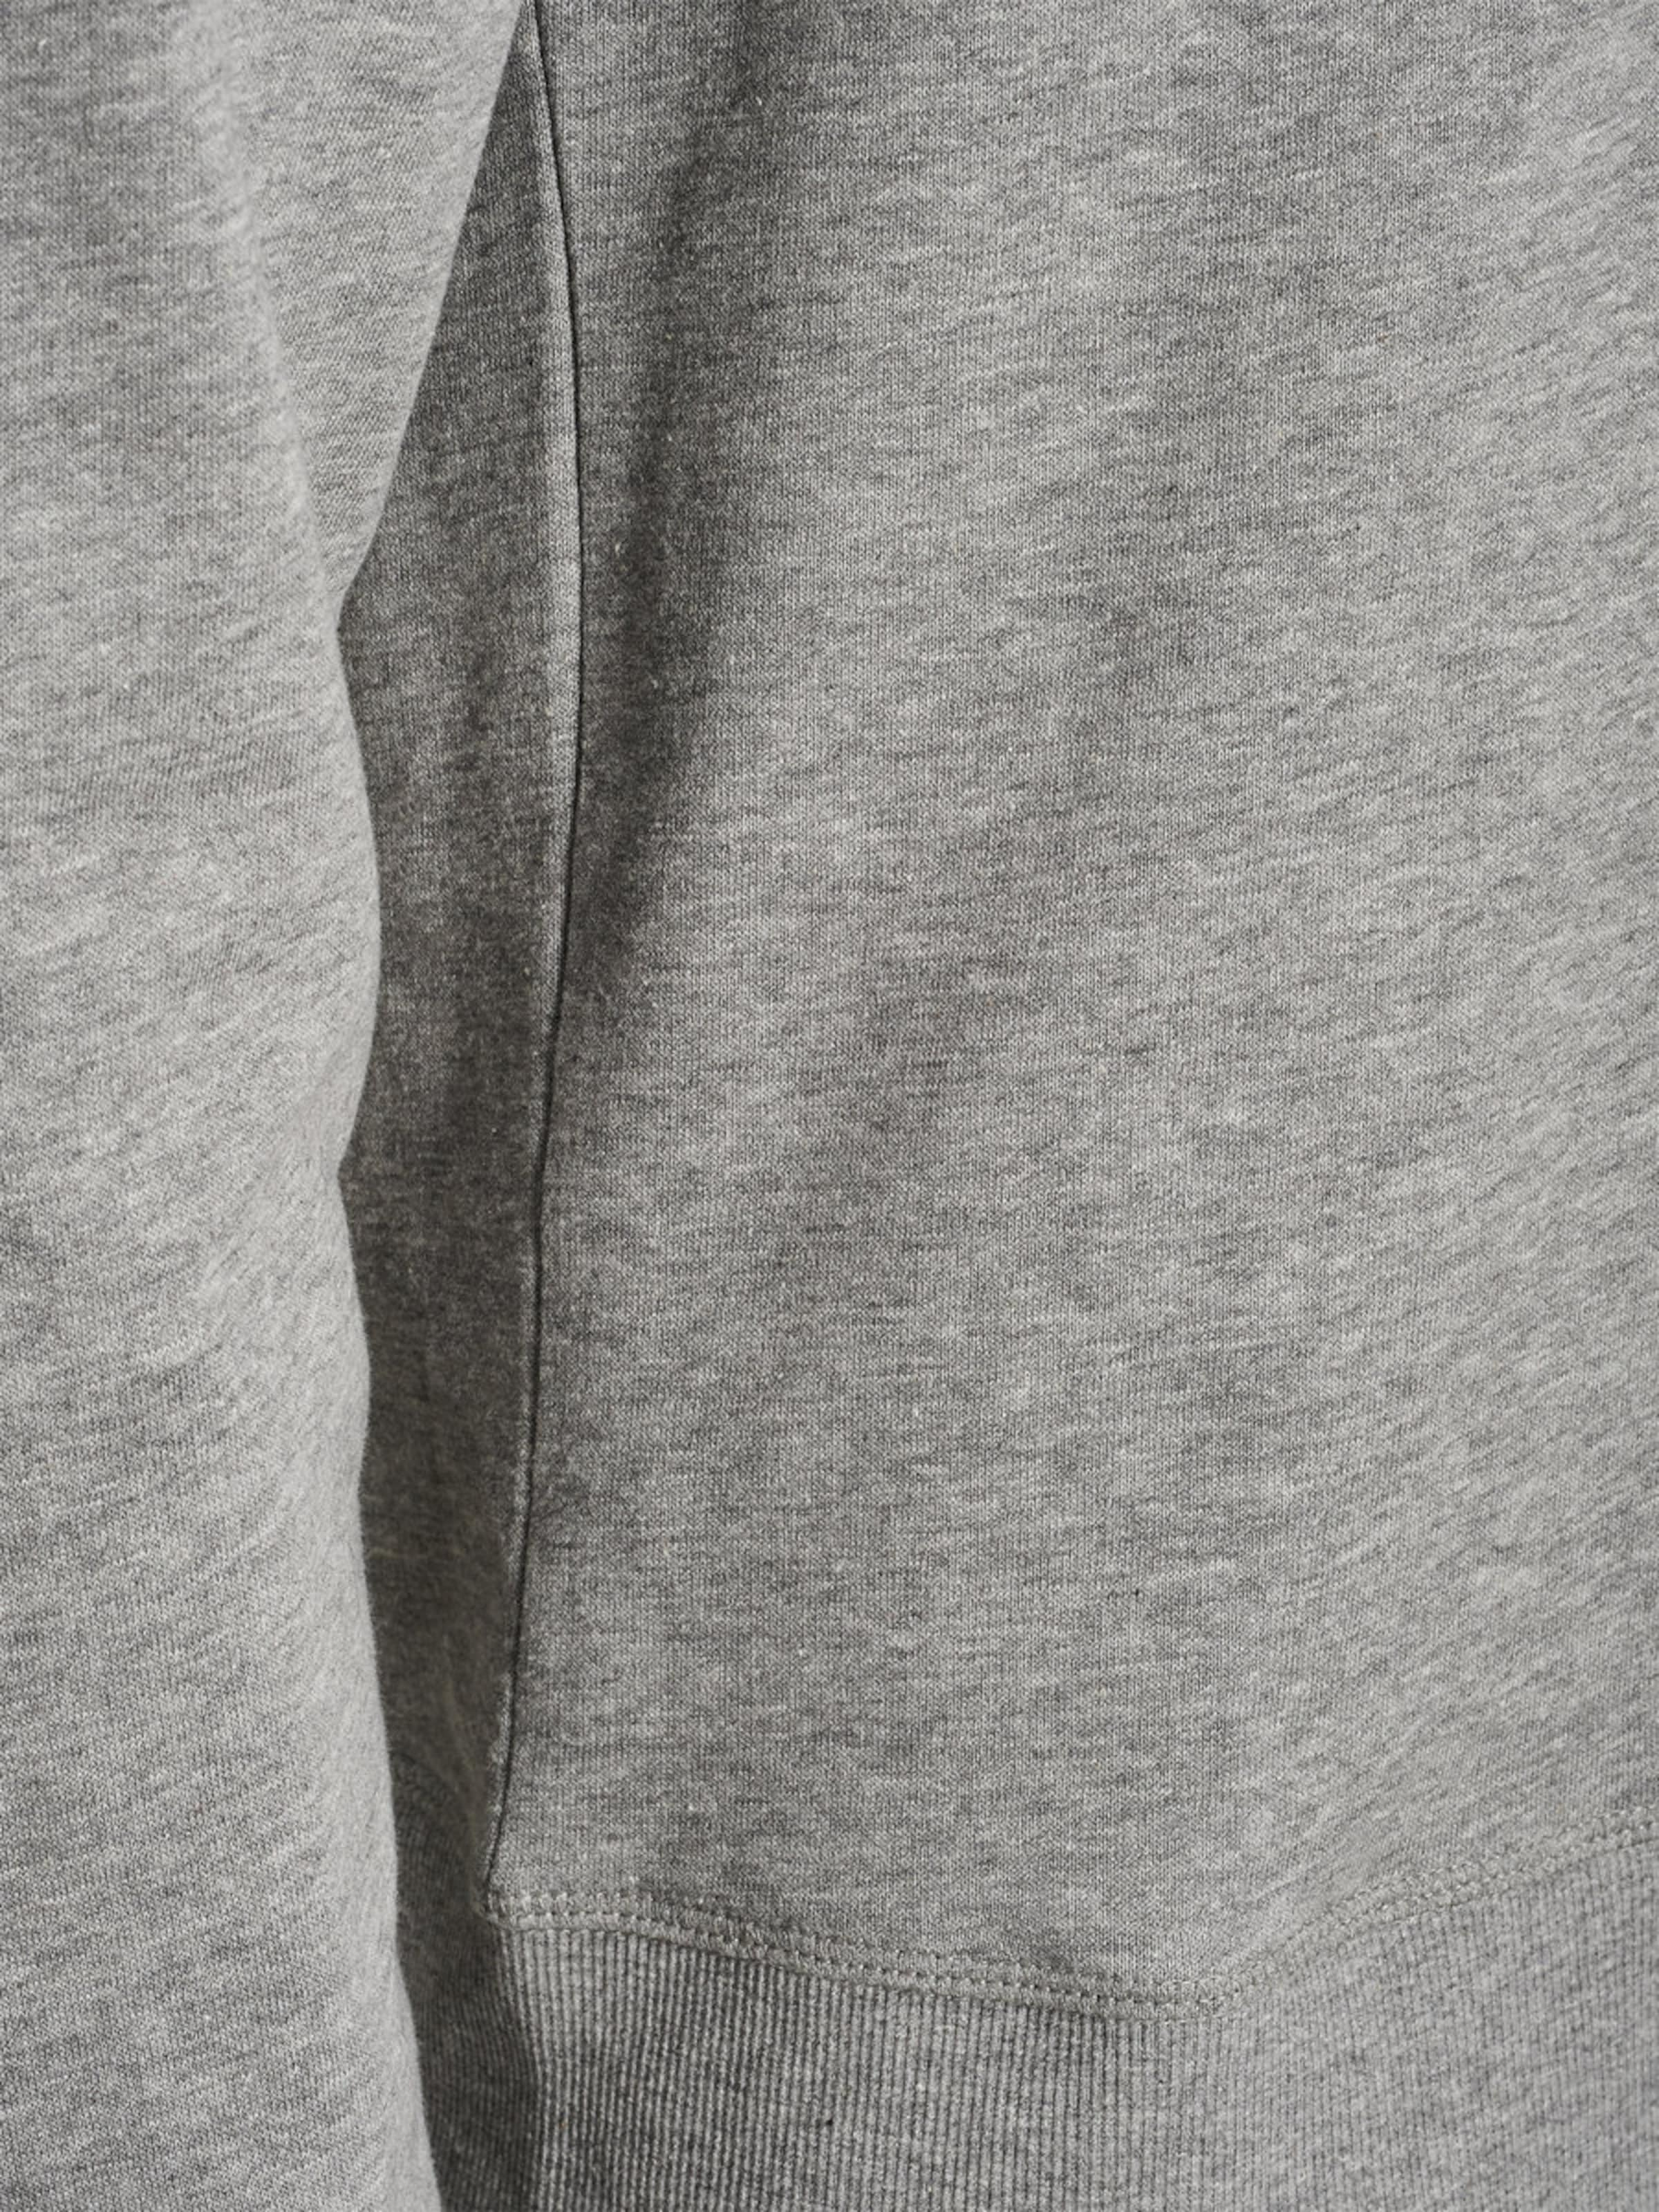 Produkt Sweatshirt Sweatshirt Produkt Sweatshirt Sweatshirt Sweatshirt Produkt Produkt Produkt 85WzqR7w